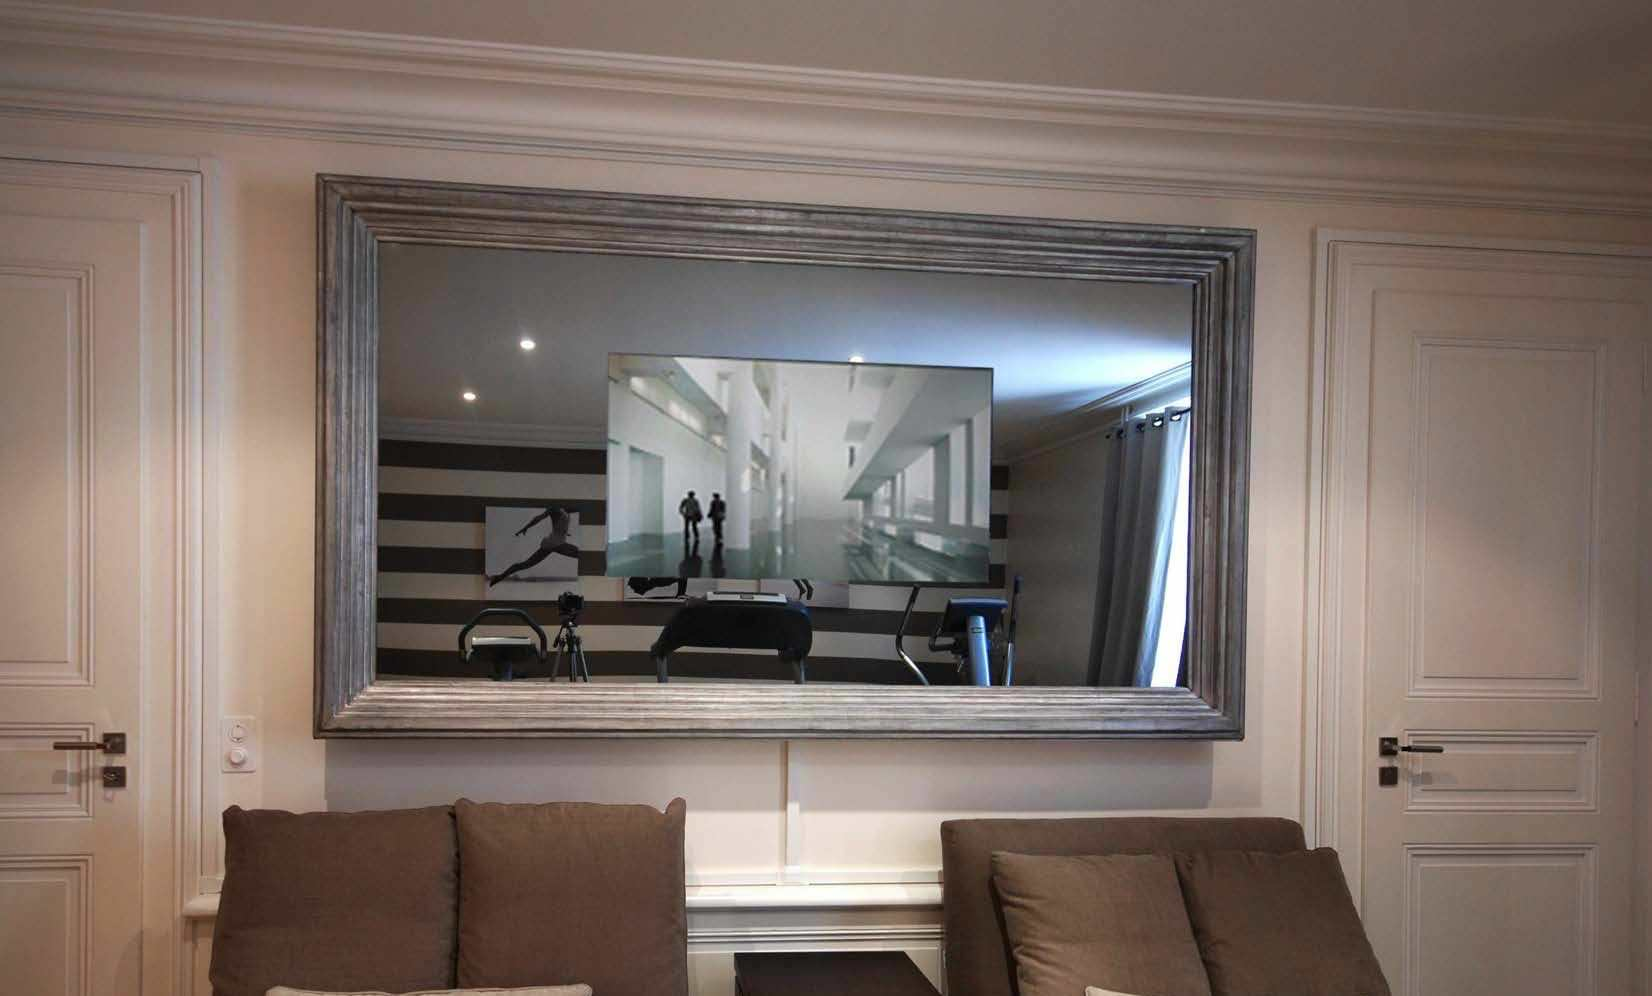 Wandmontierter TV-Spiegel / Wohnzimmer / Barock / rechteckig - Raymura